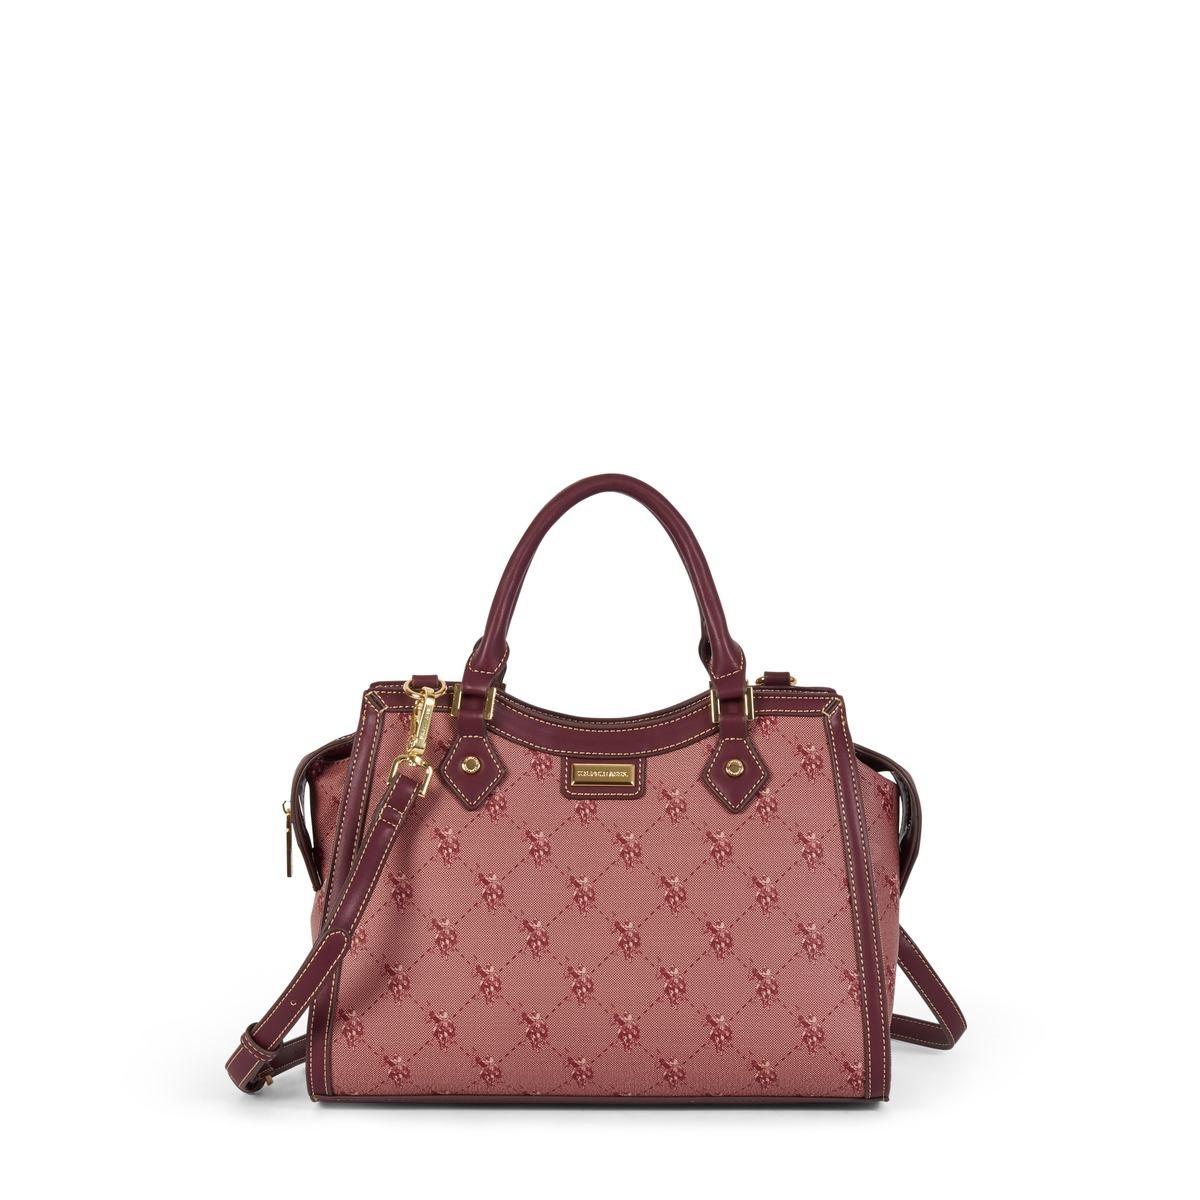 US Polo Assn. Τσάντα χειρός γυναικεία 33x15x23cm Hampton Wine